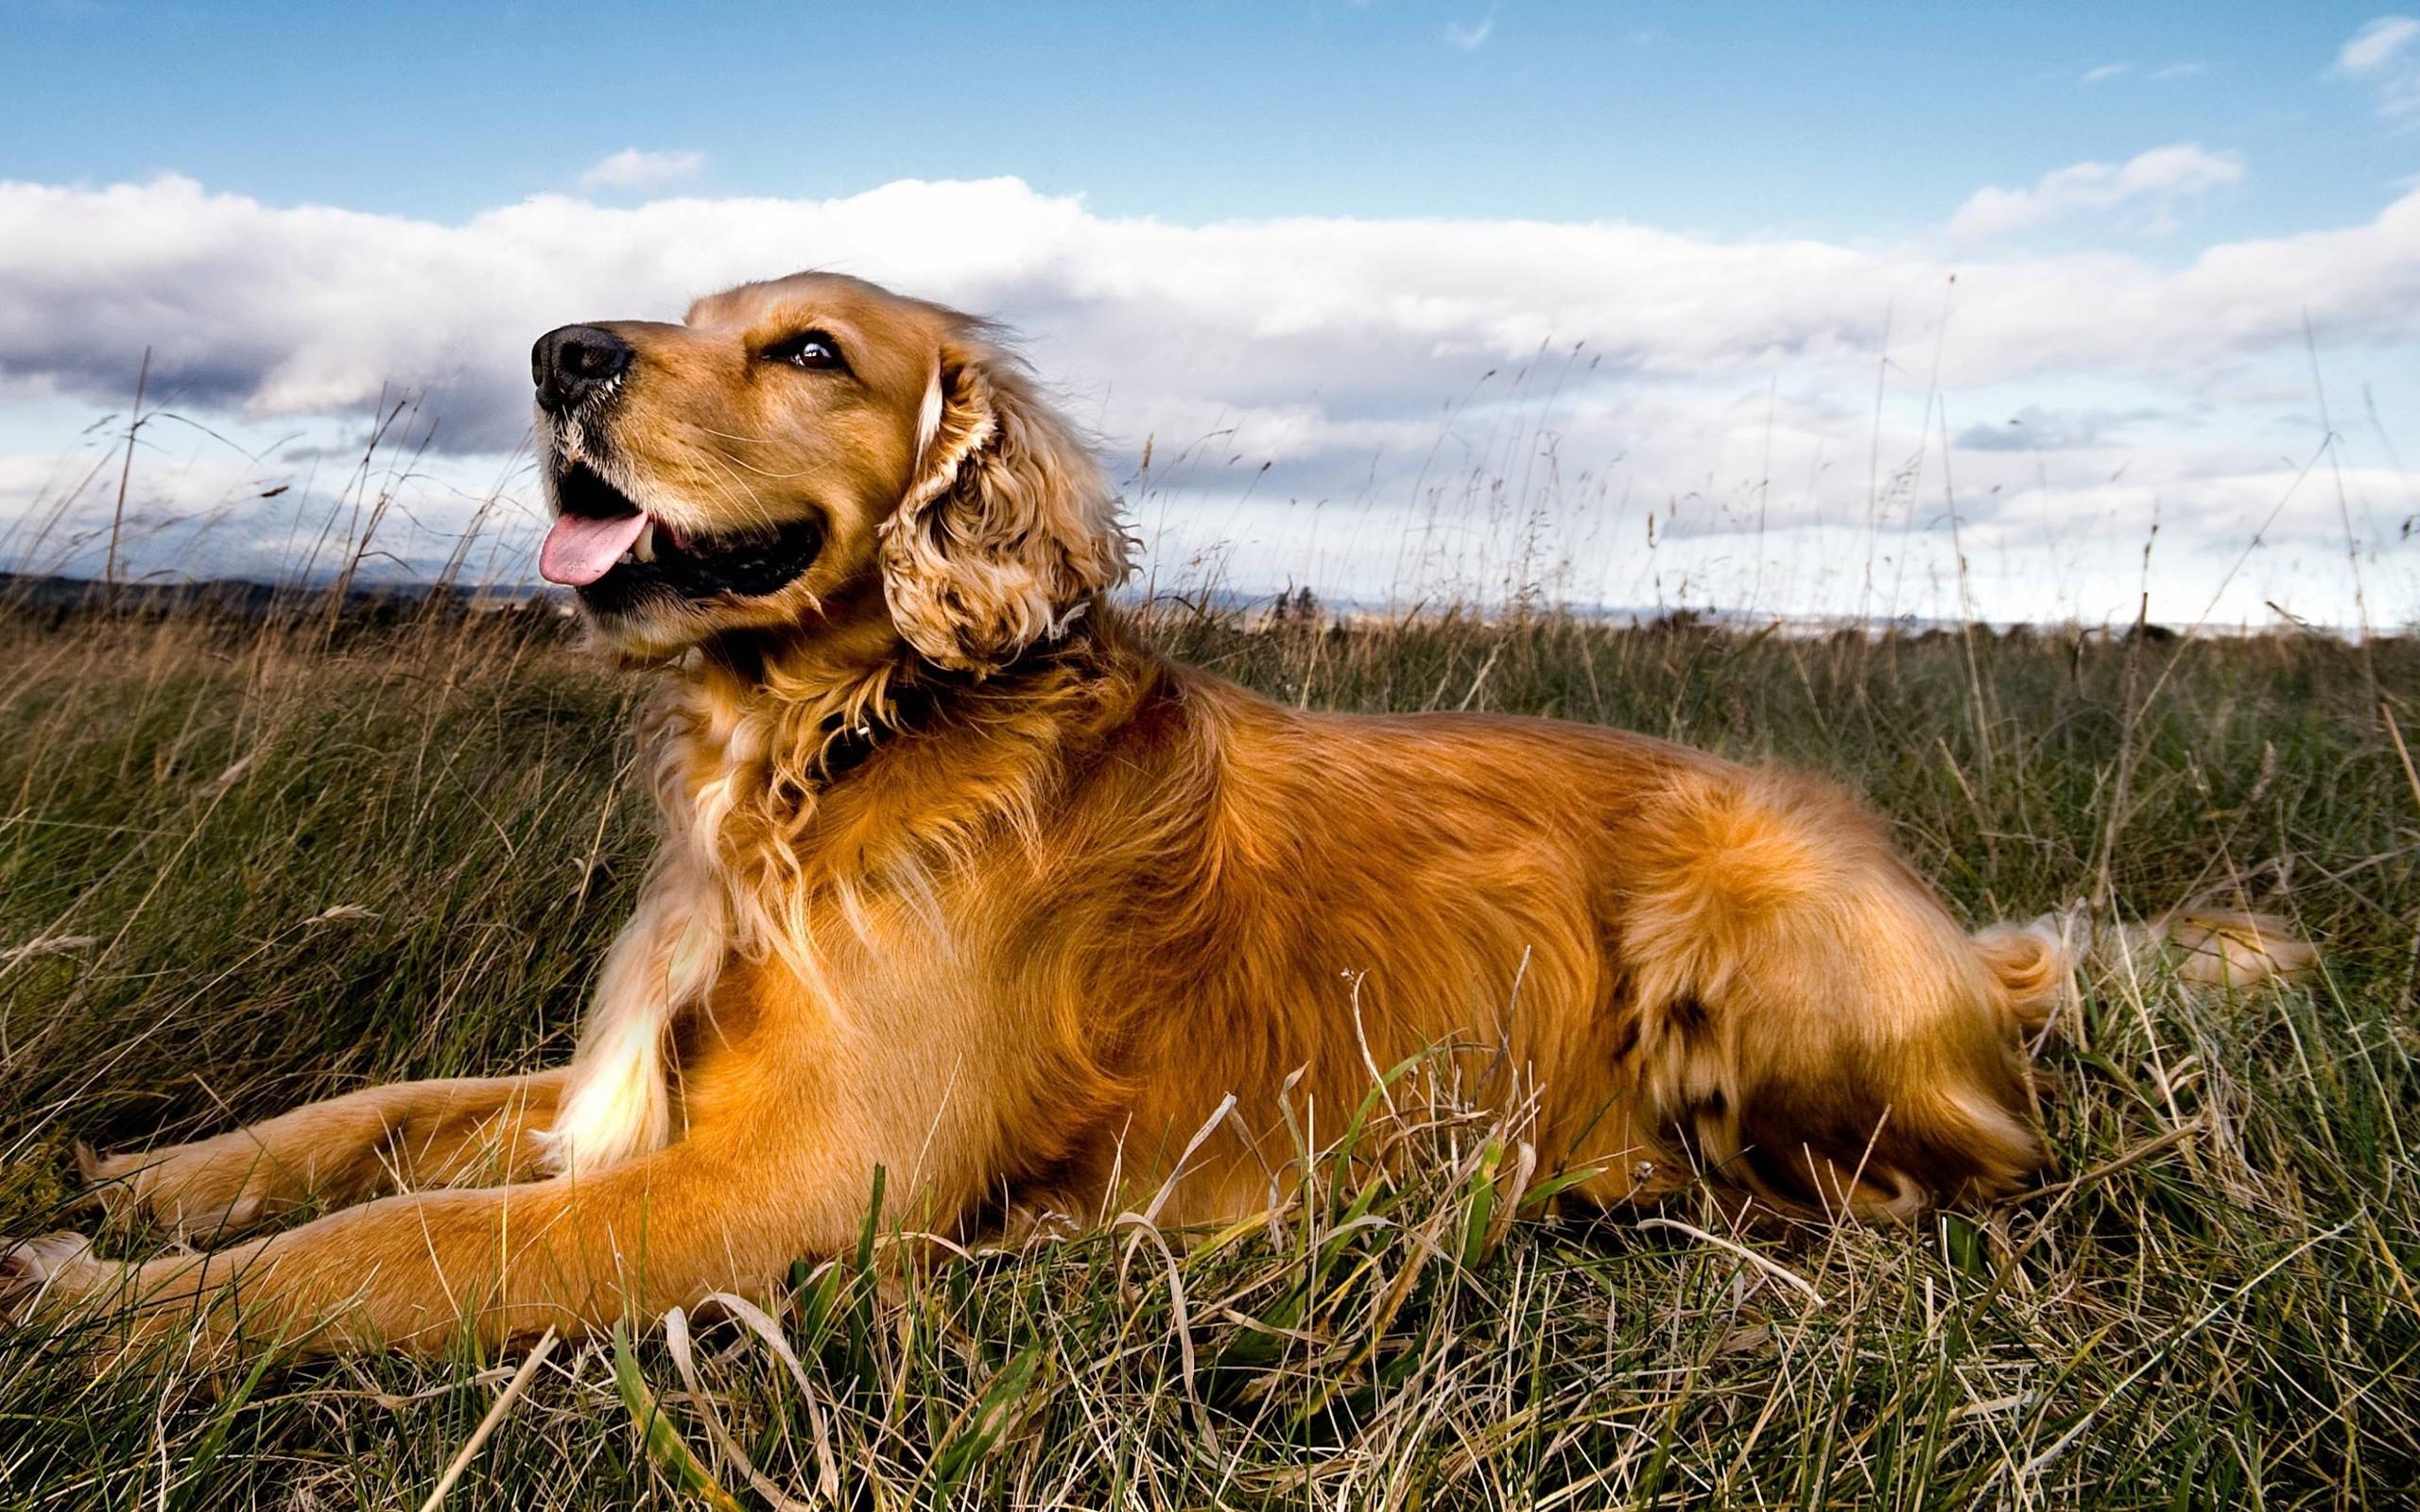 пёс язык собака на бревне  № 2524020 бесплатно